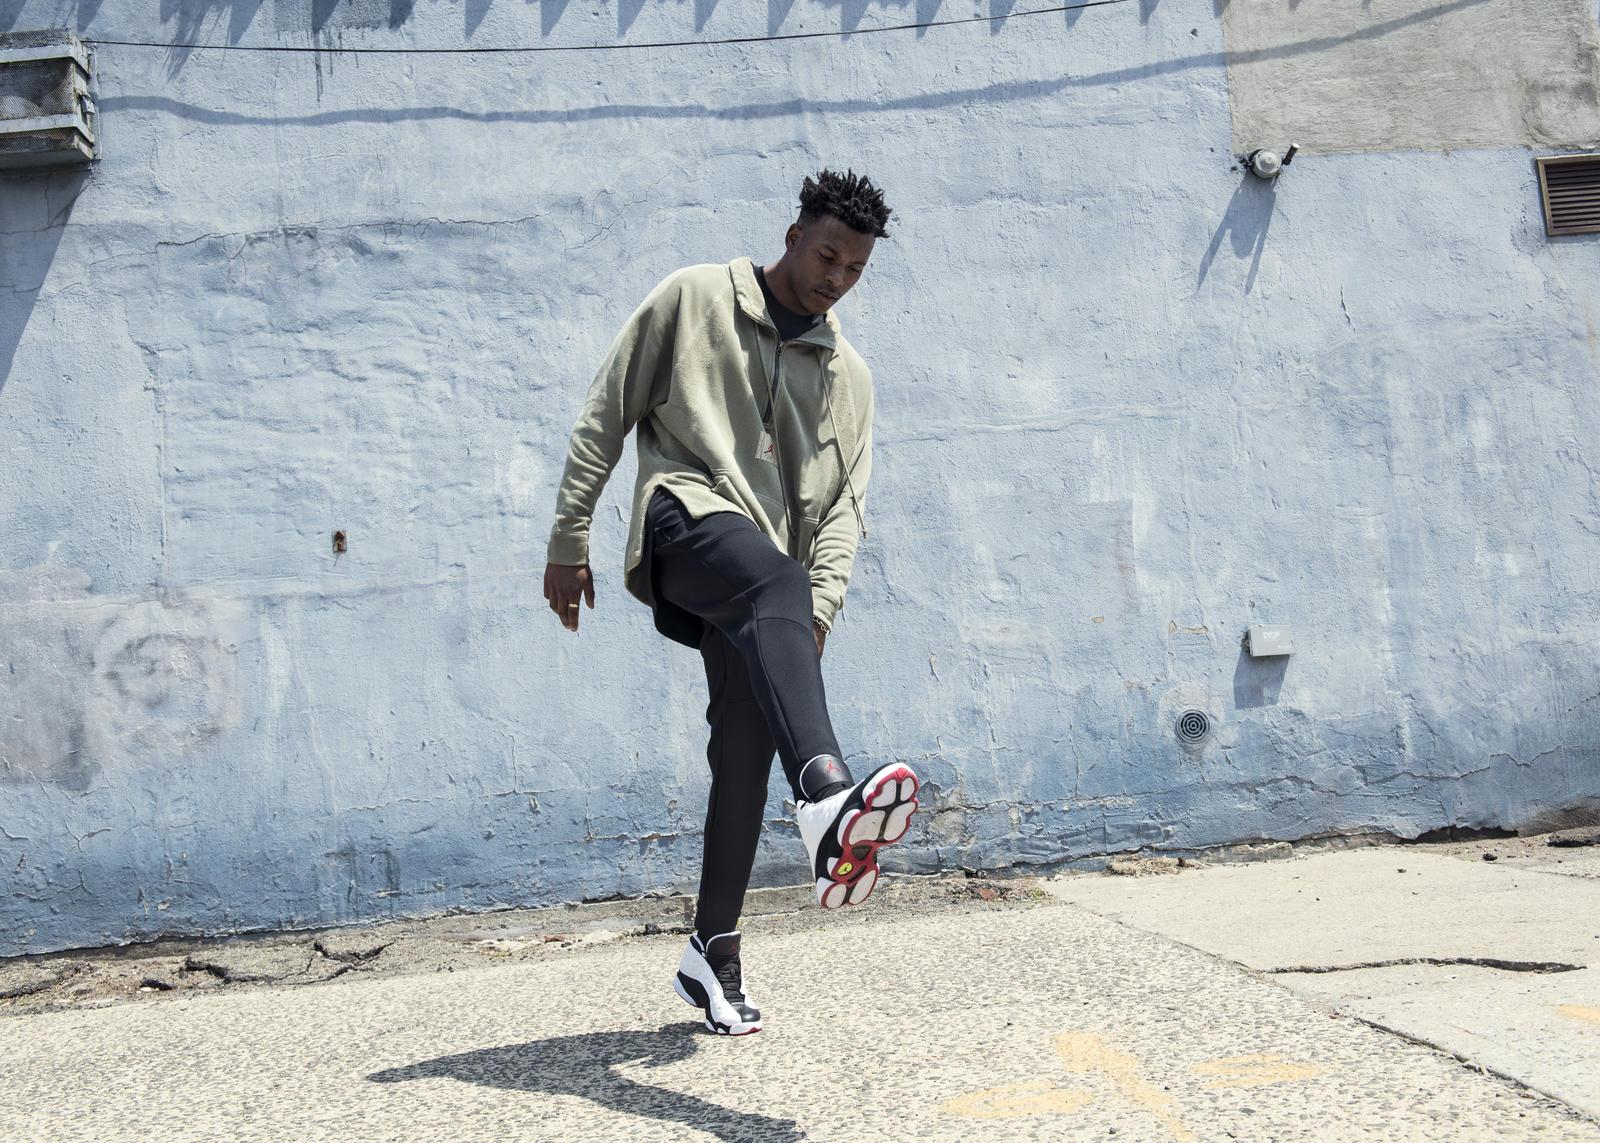 7ed306f4cbc4 Jordan Brand Fall 2018 Preview - Nike News